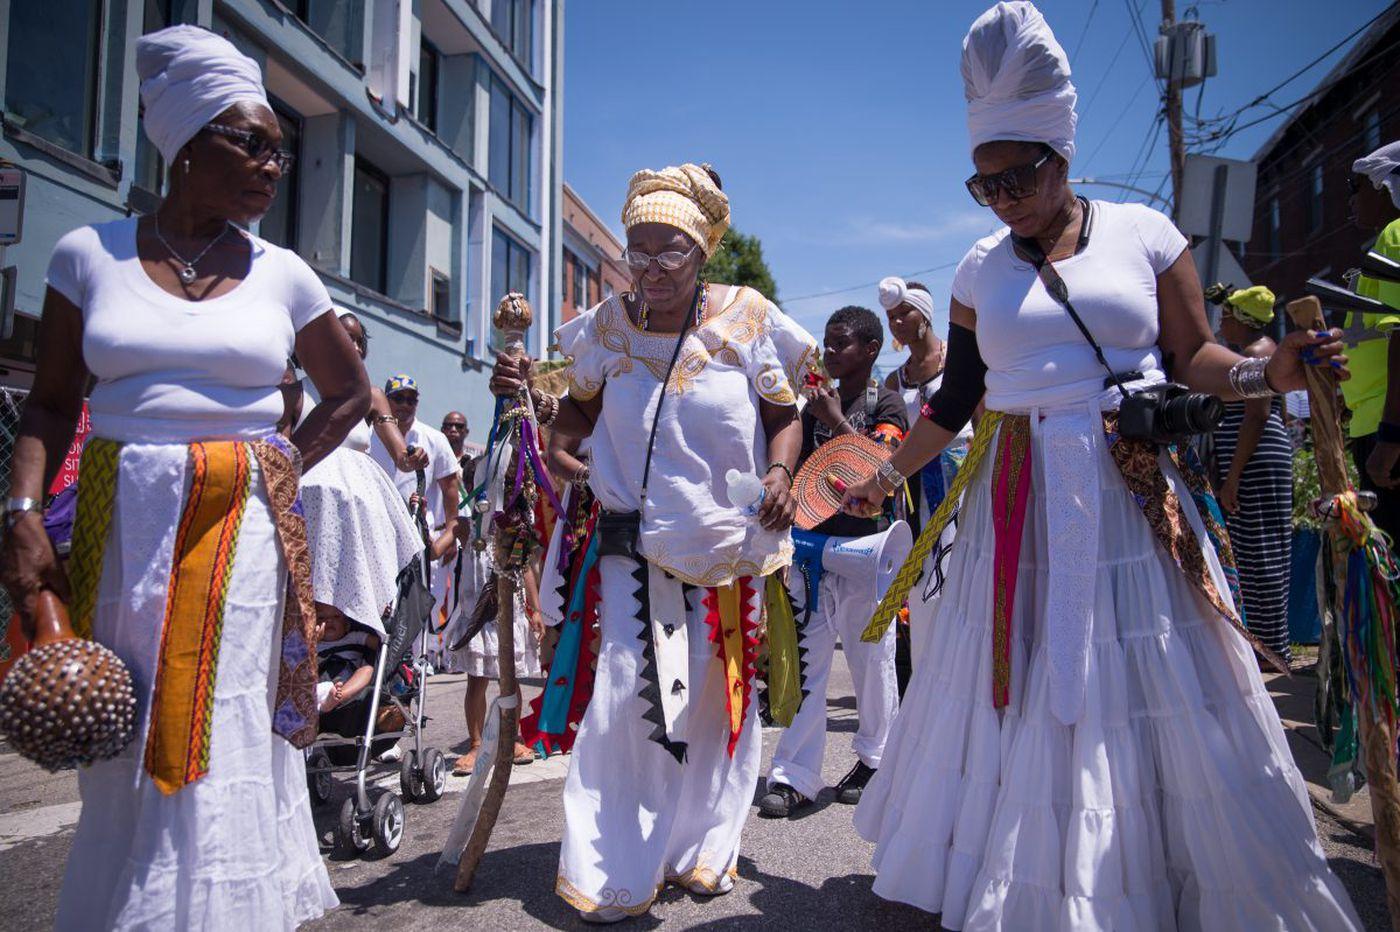 Philadelphia's summer festivals from Wawa Welcome America and Odunde to the Philadelphia Folk Festival